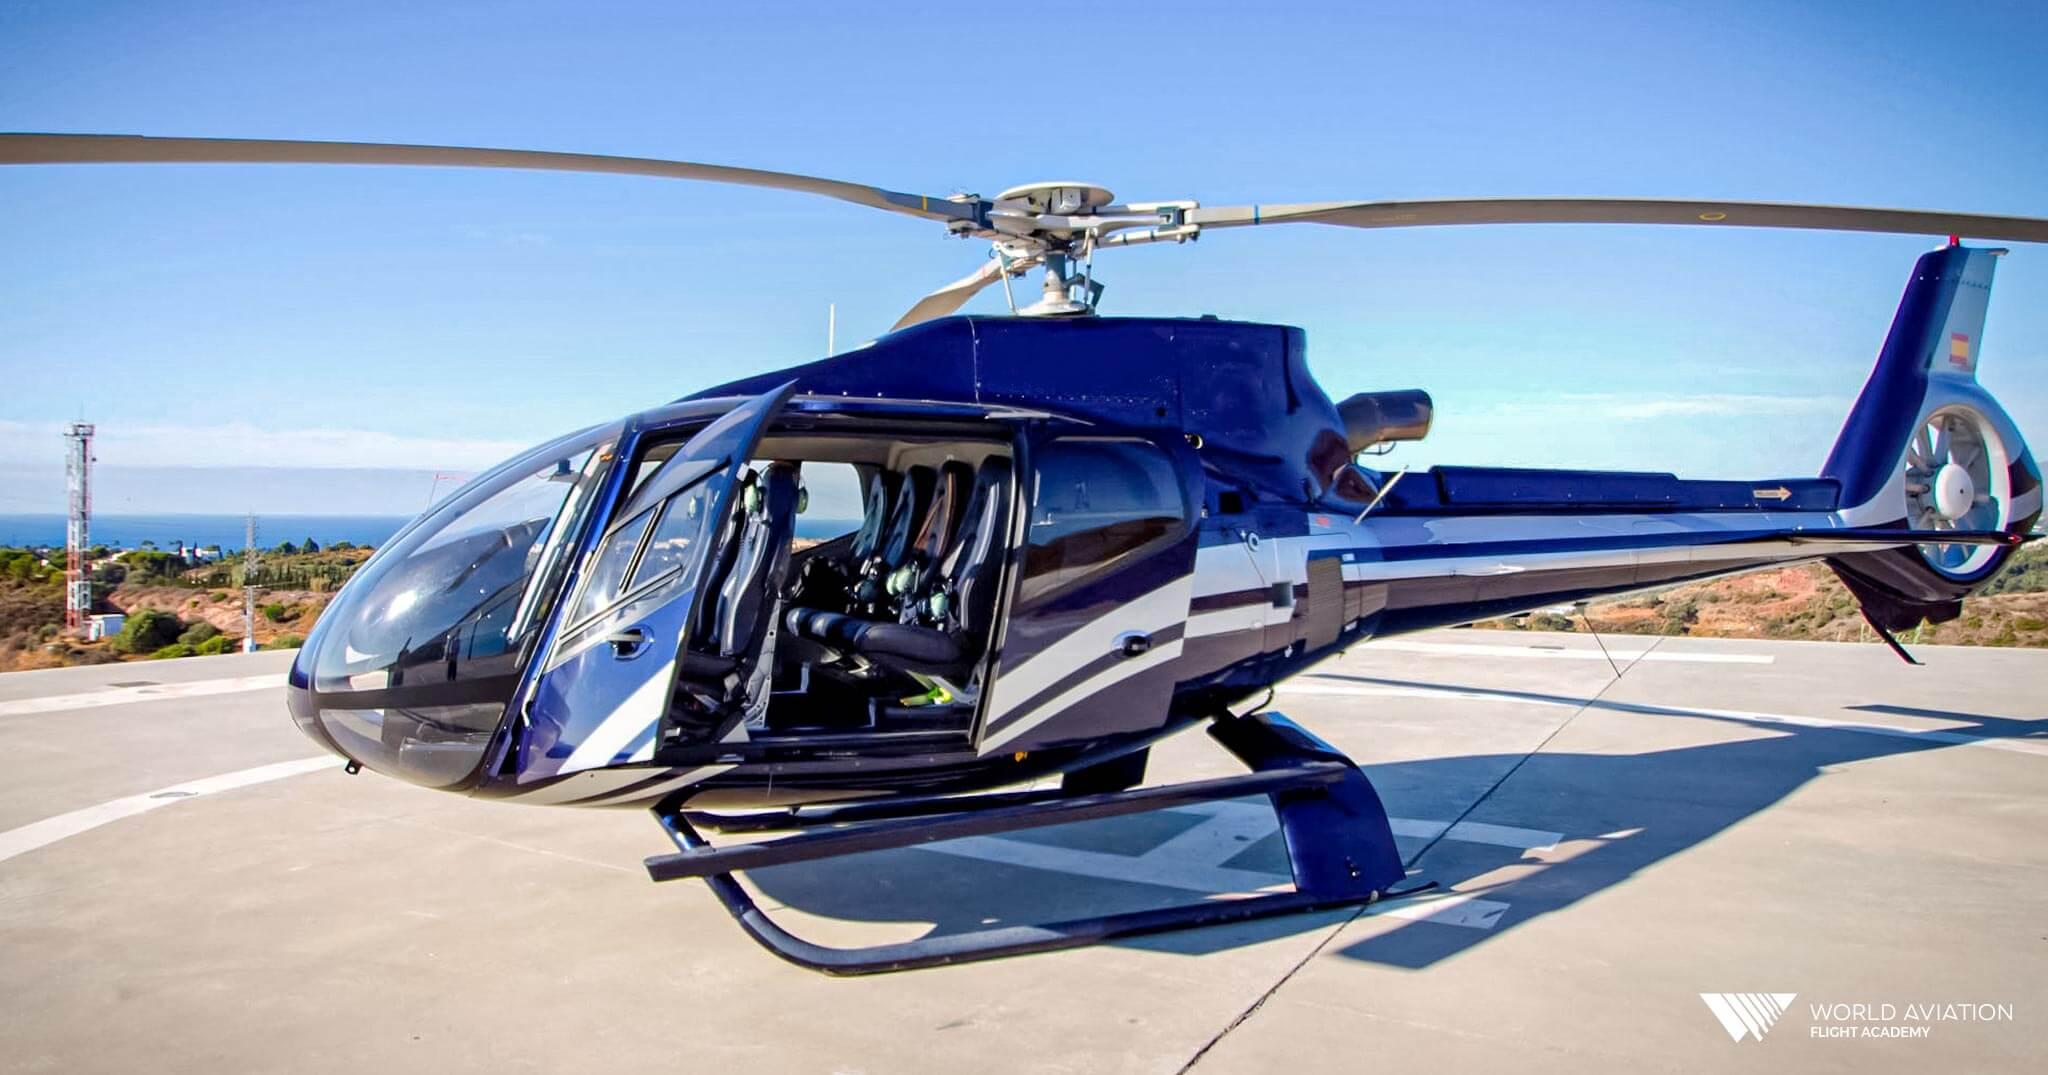 B4 Piloto de Helicóptero World Aviation